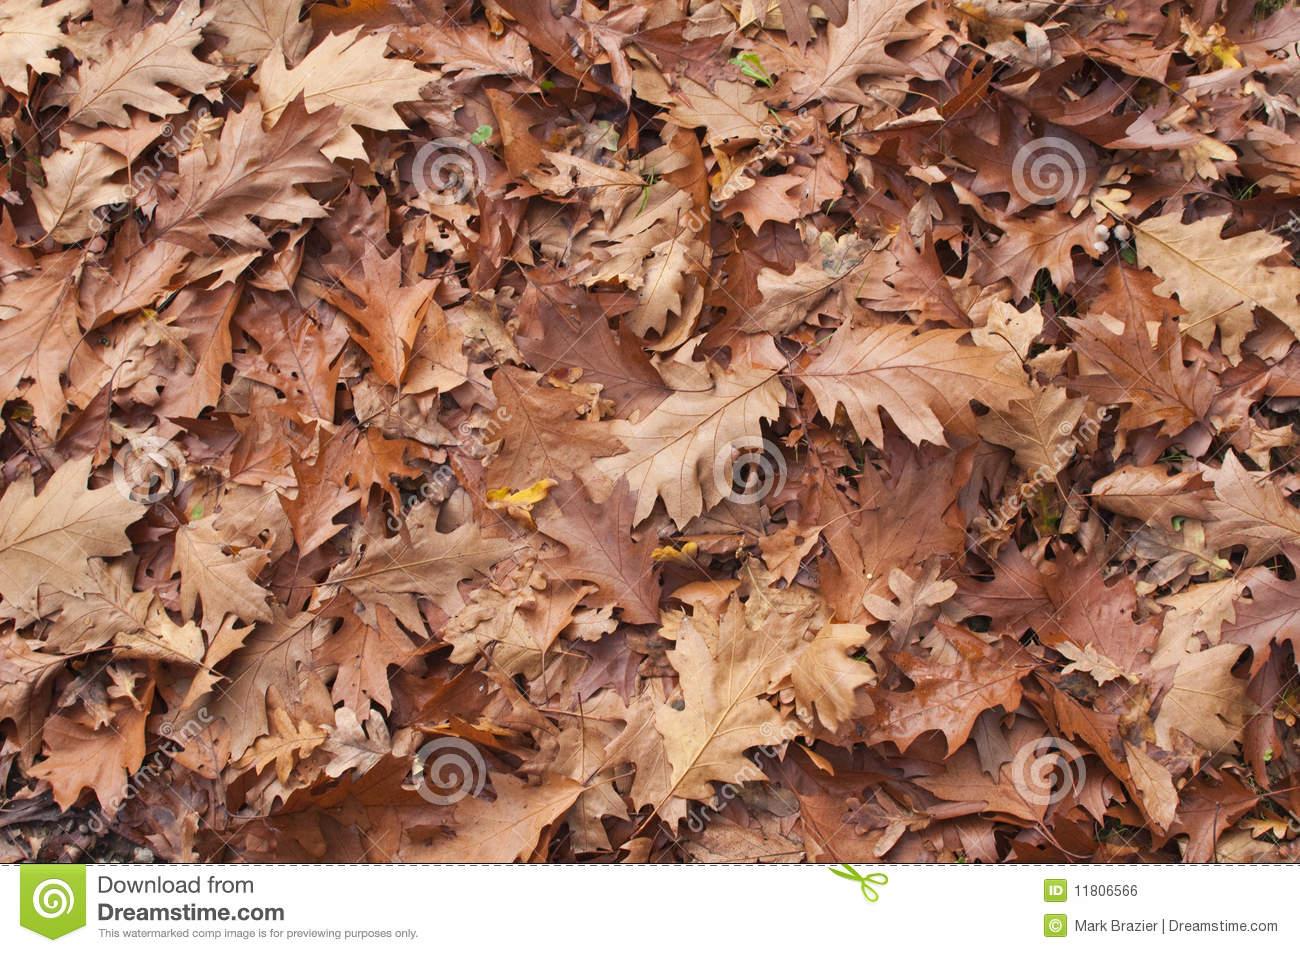 Leaf Litter Carpet Fallen On Woodland Floor Royalty Free Stock.